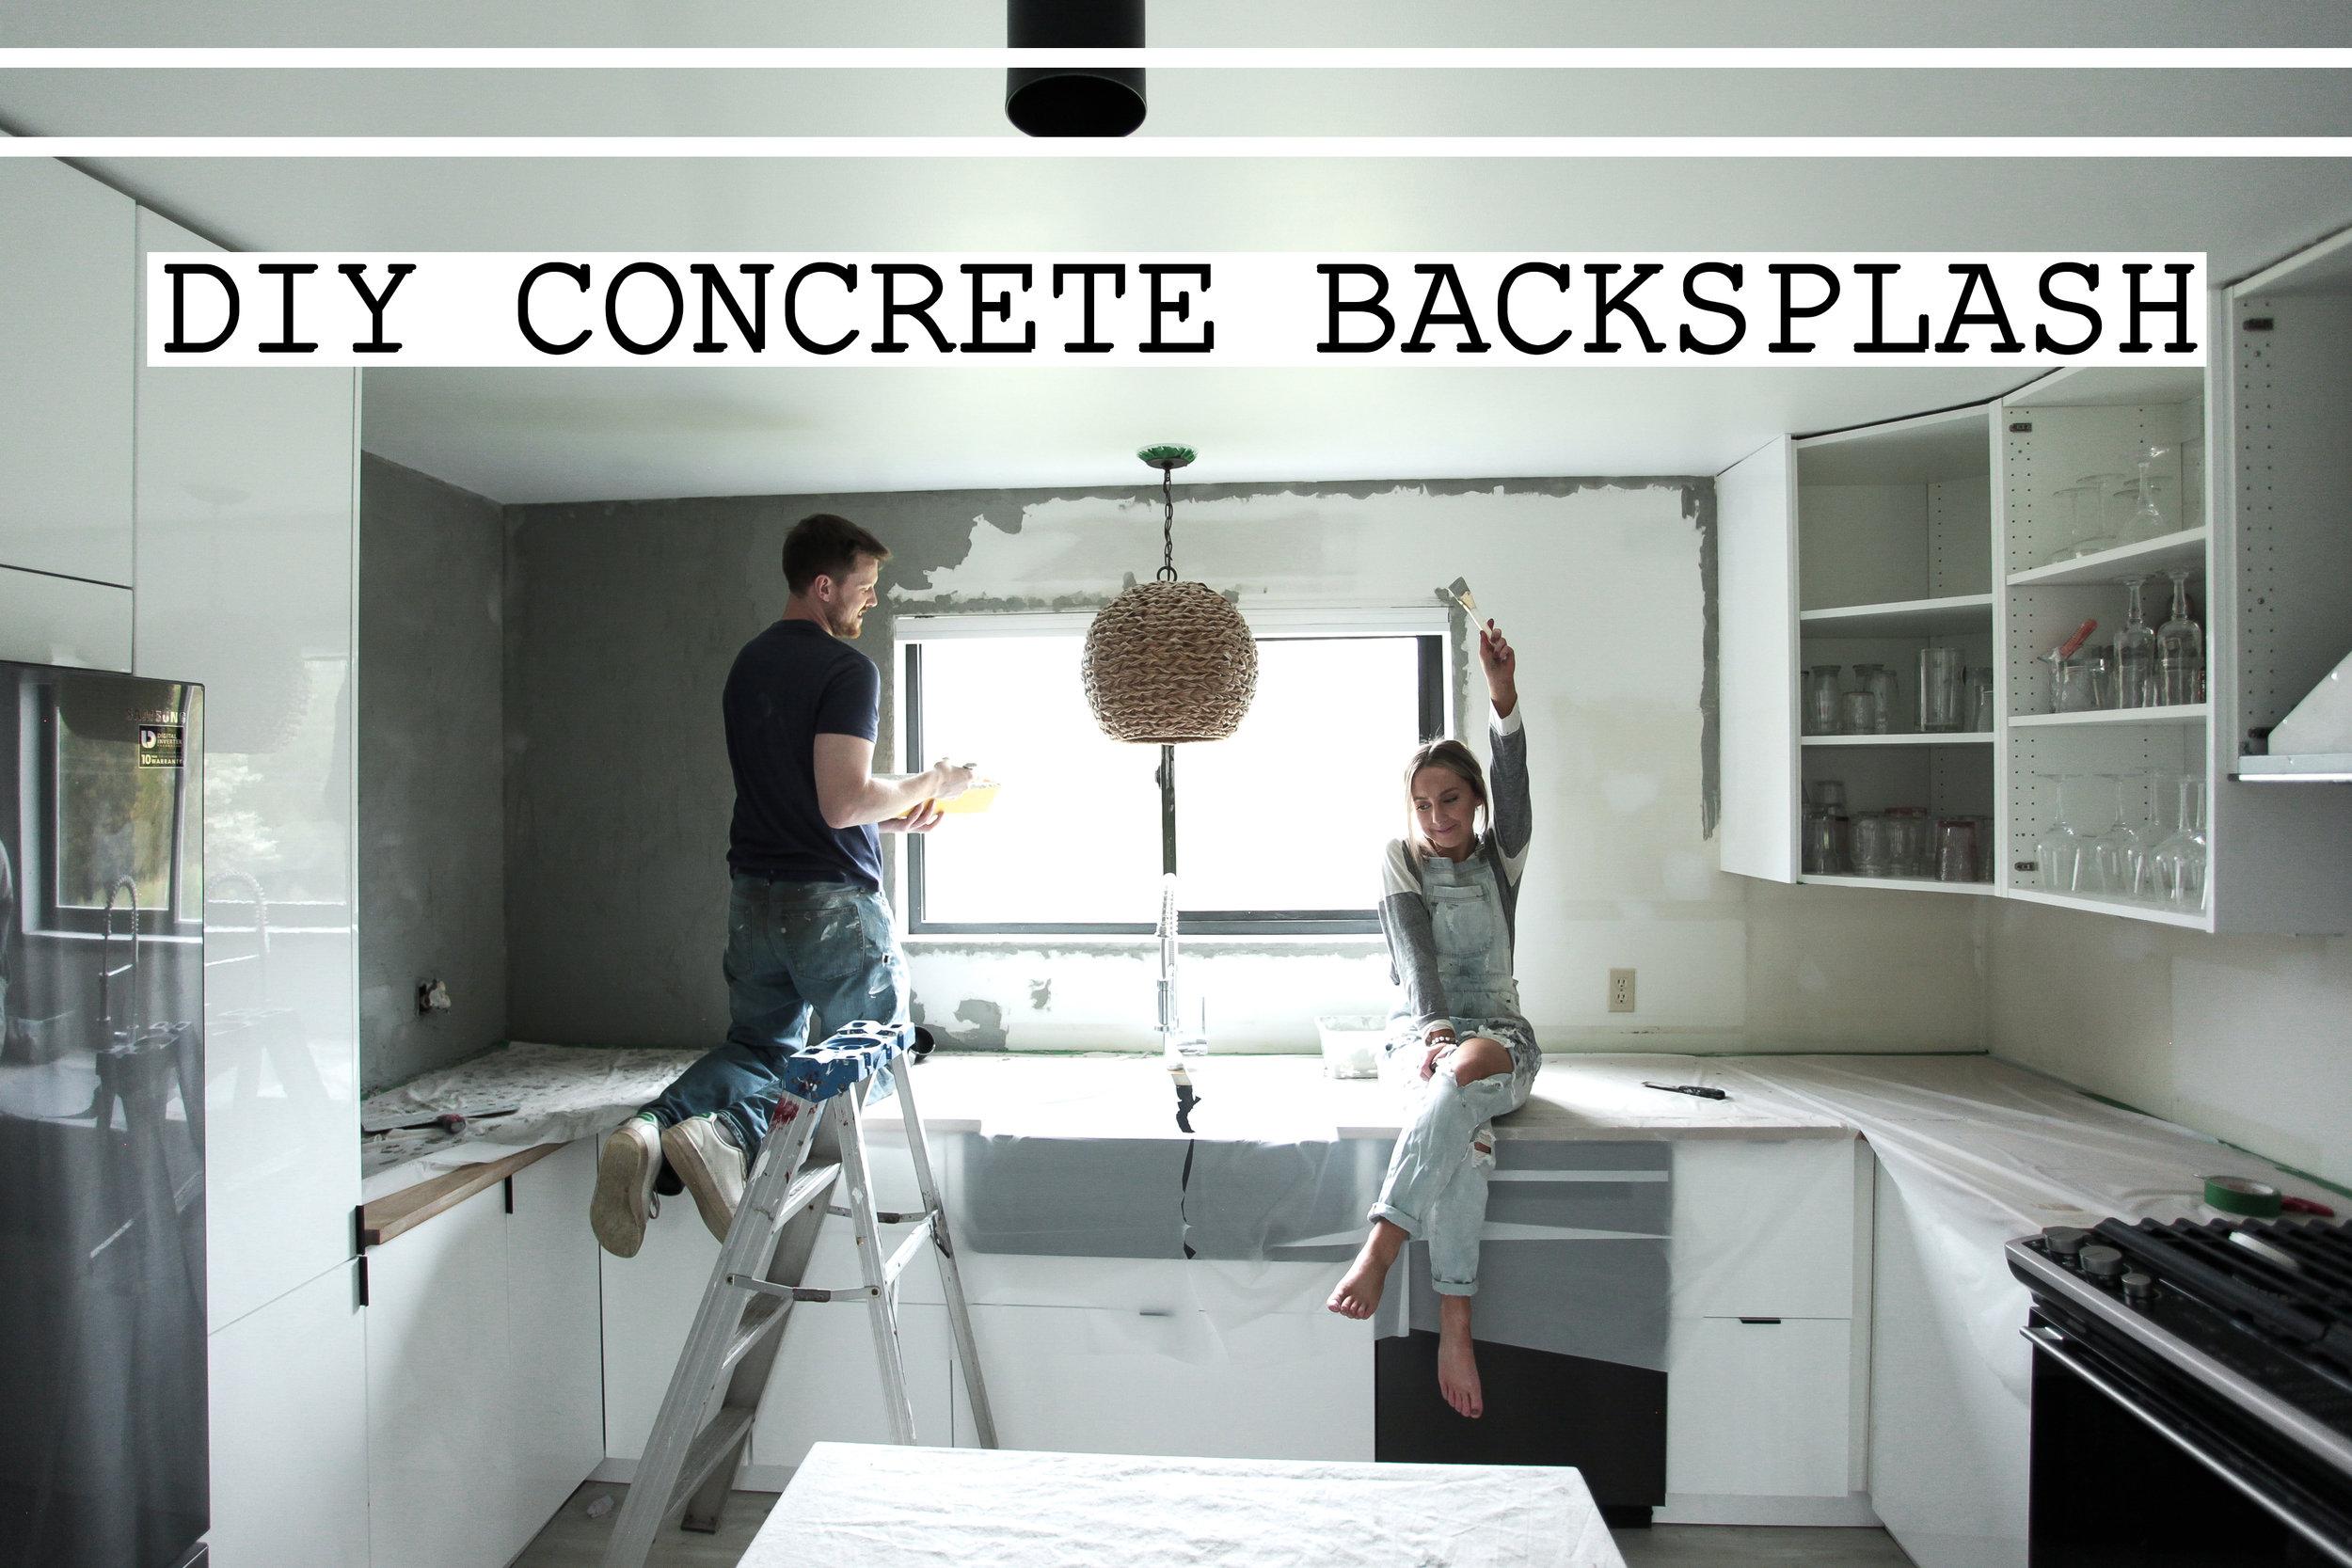 diy concrete backsplash .jpg